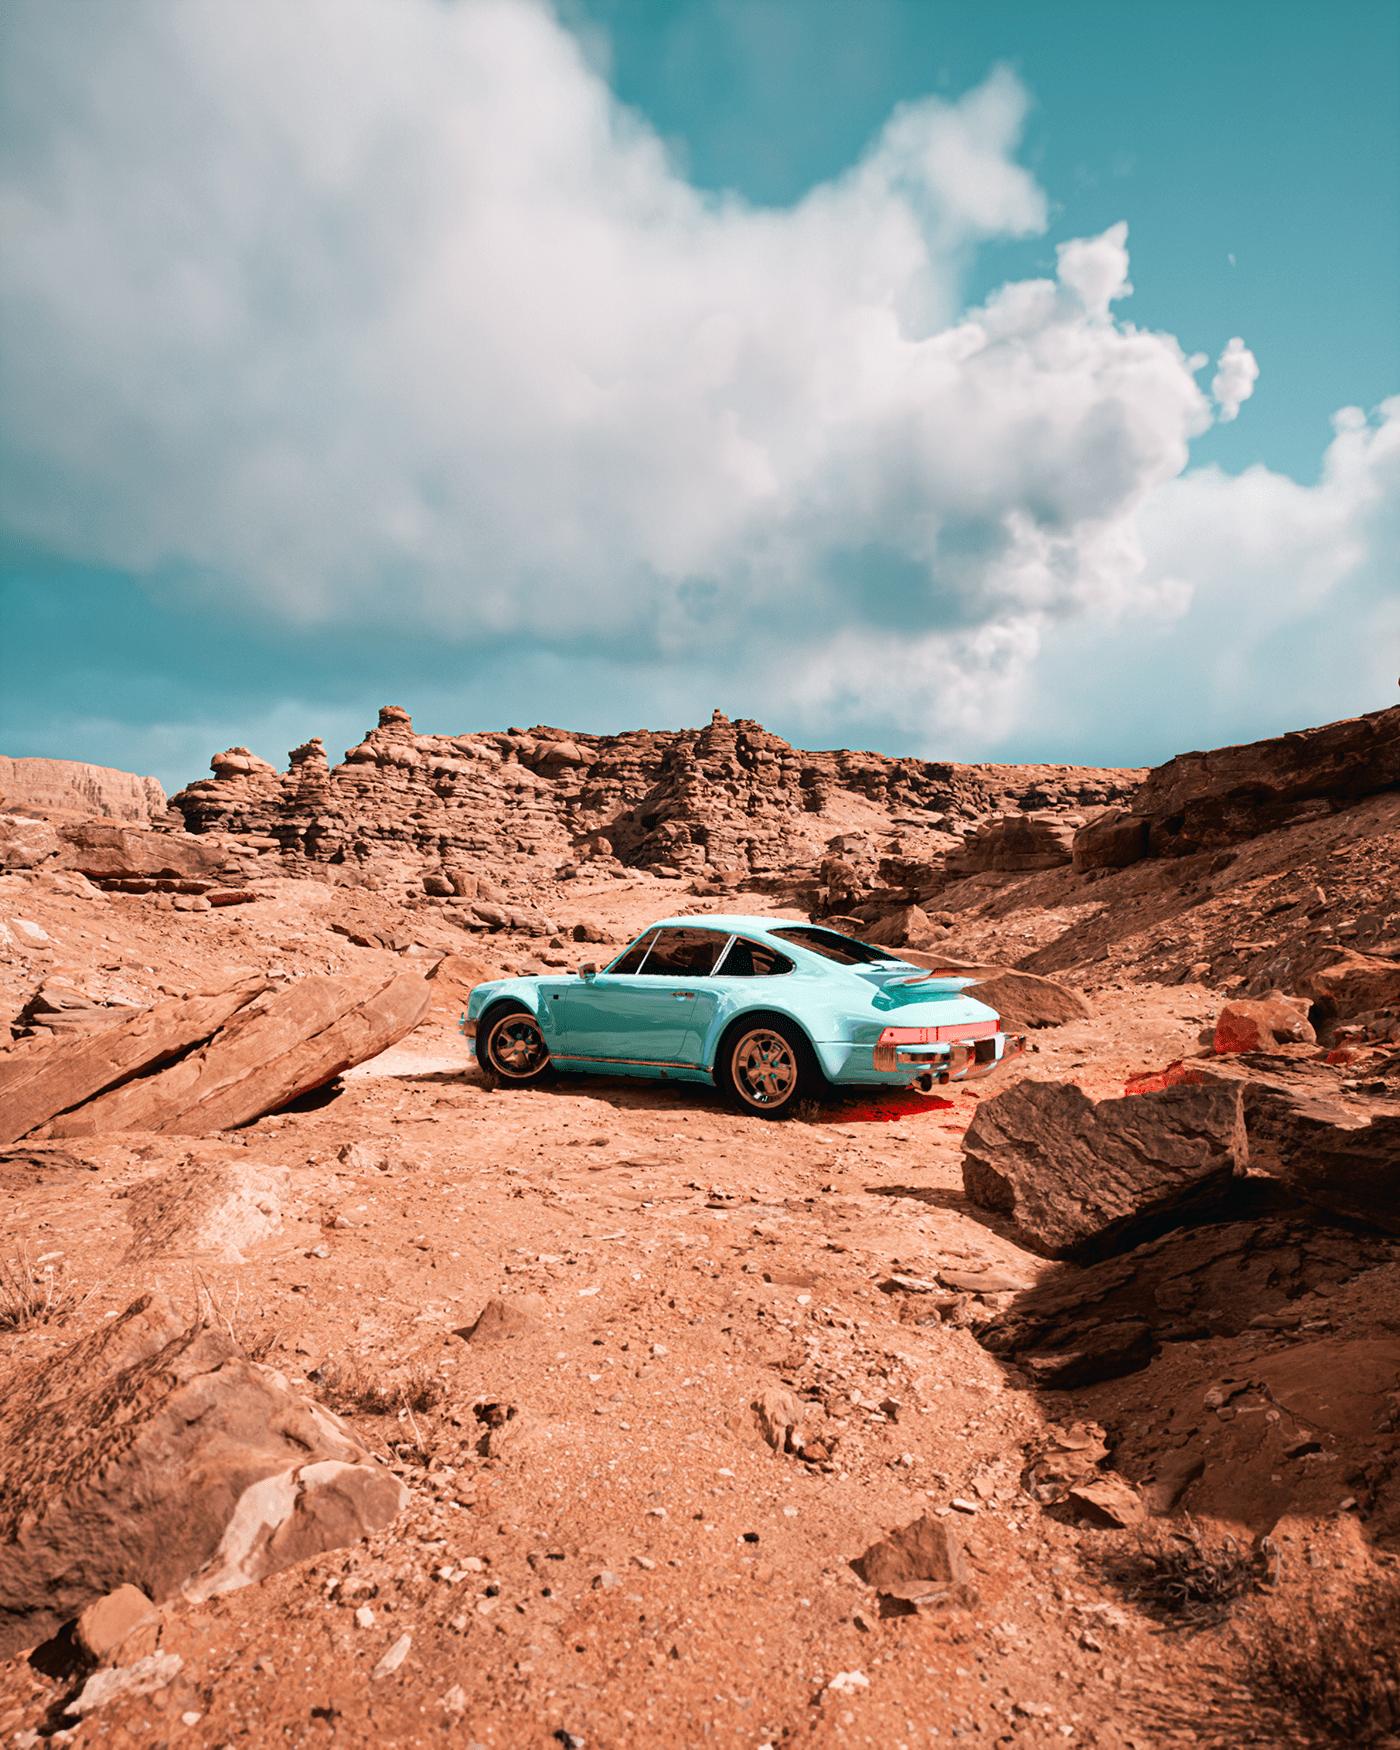 CG Grand Canyon photo Porsche Porsche 911 realistic Render UE4 UE5 Unreal Engine